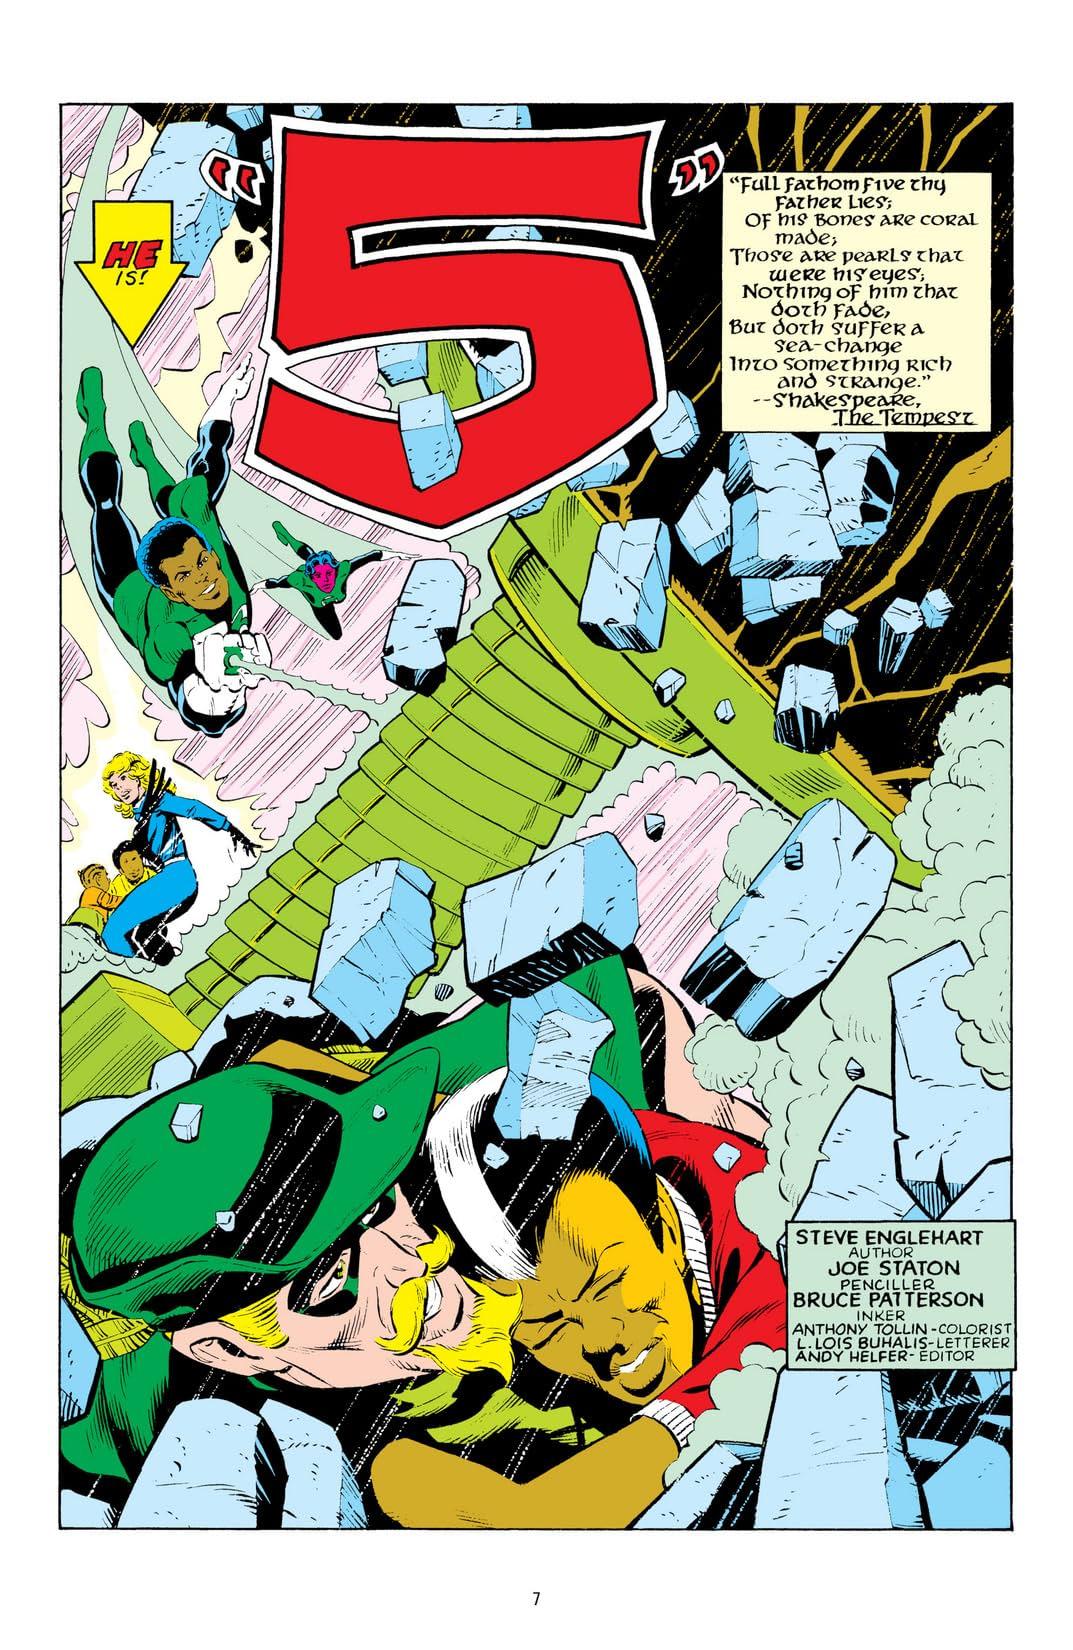 Green Lantern: Sector 2814 Vol. 3